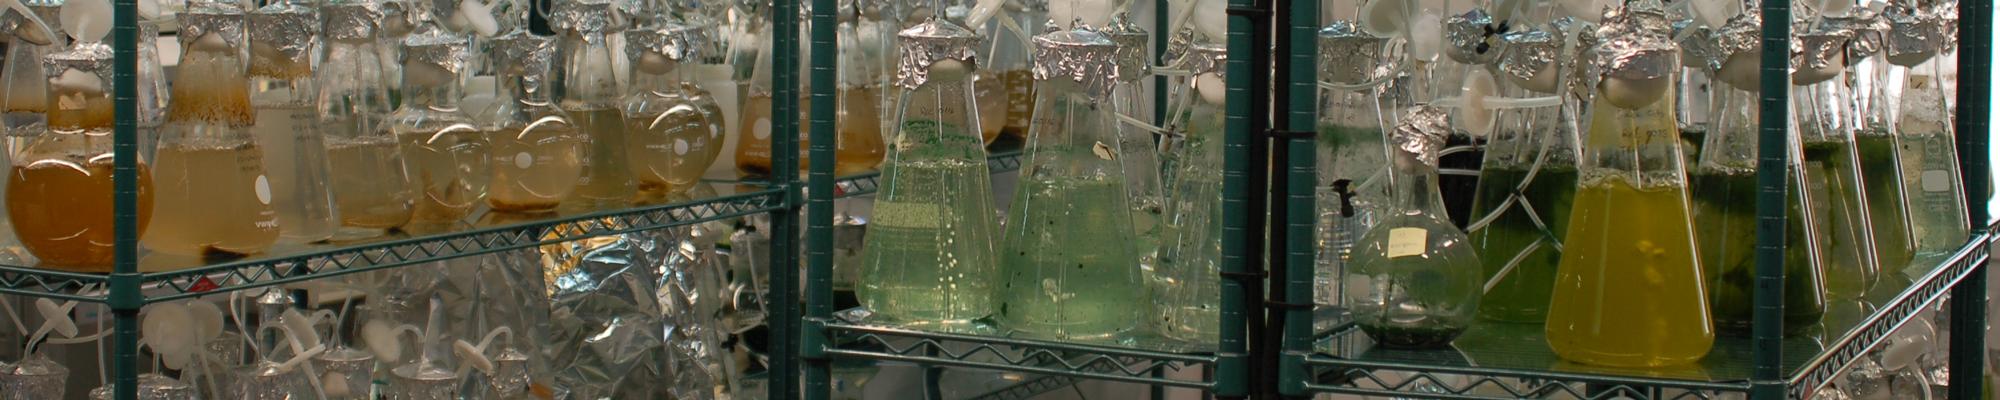 Banco de Algas - MicroBioSpain